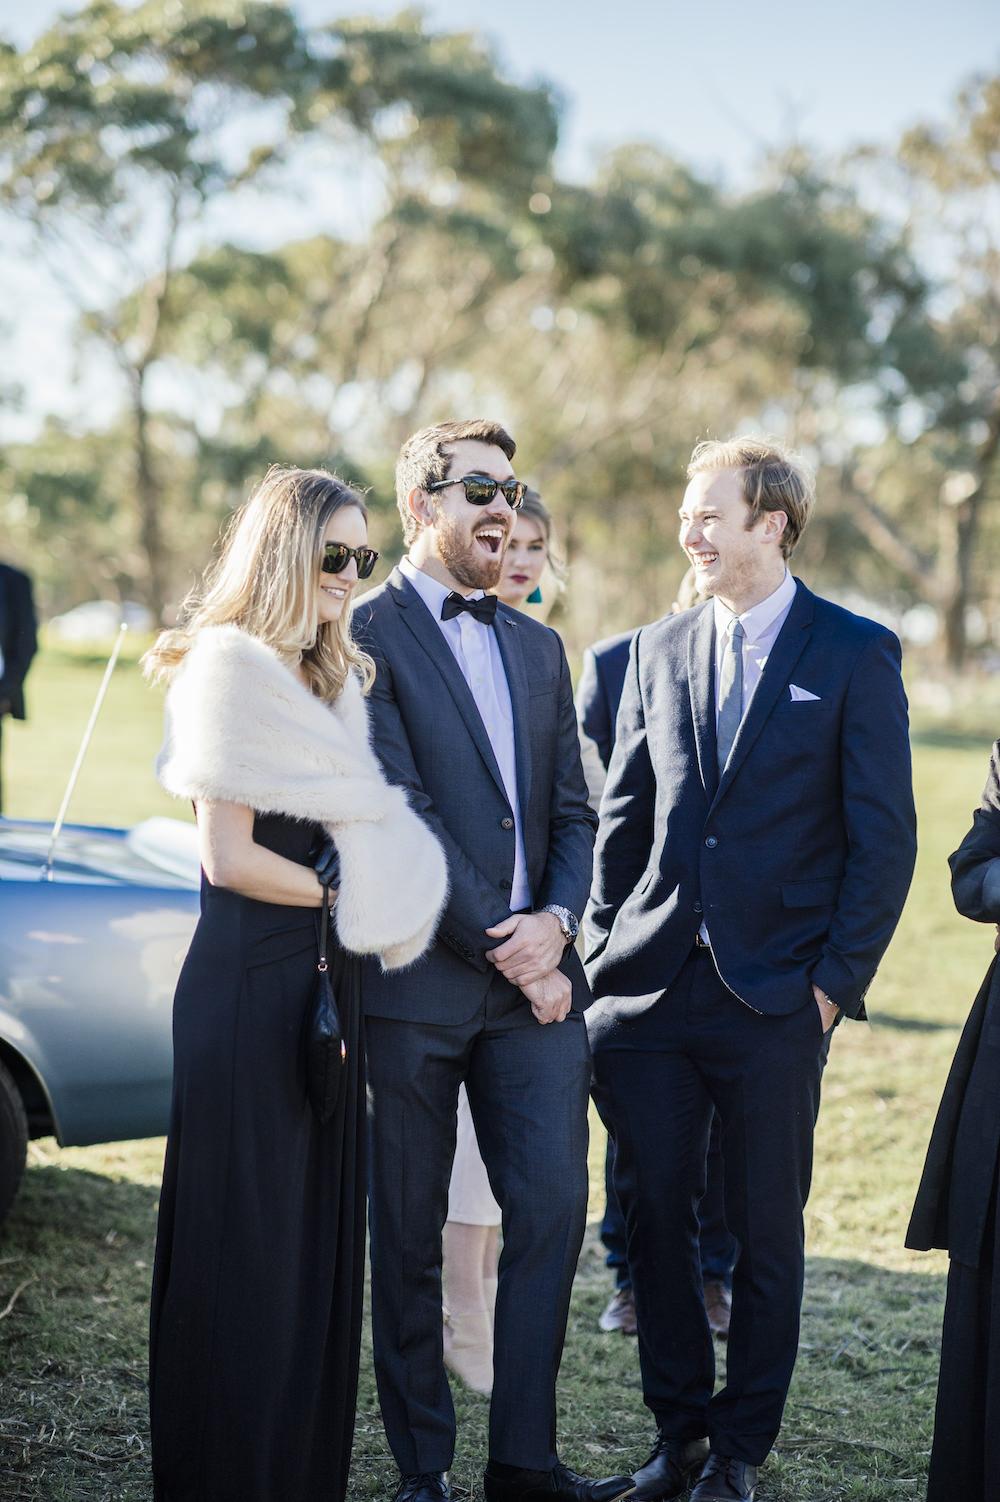 lindahamish-wedding-311.JPG